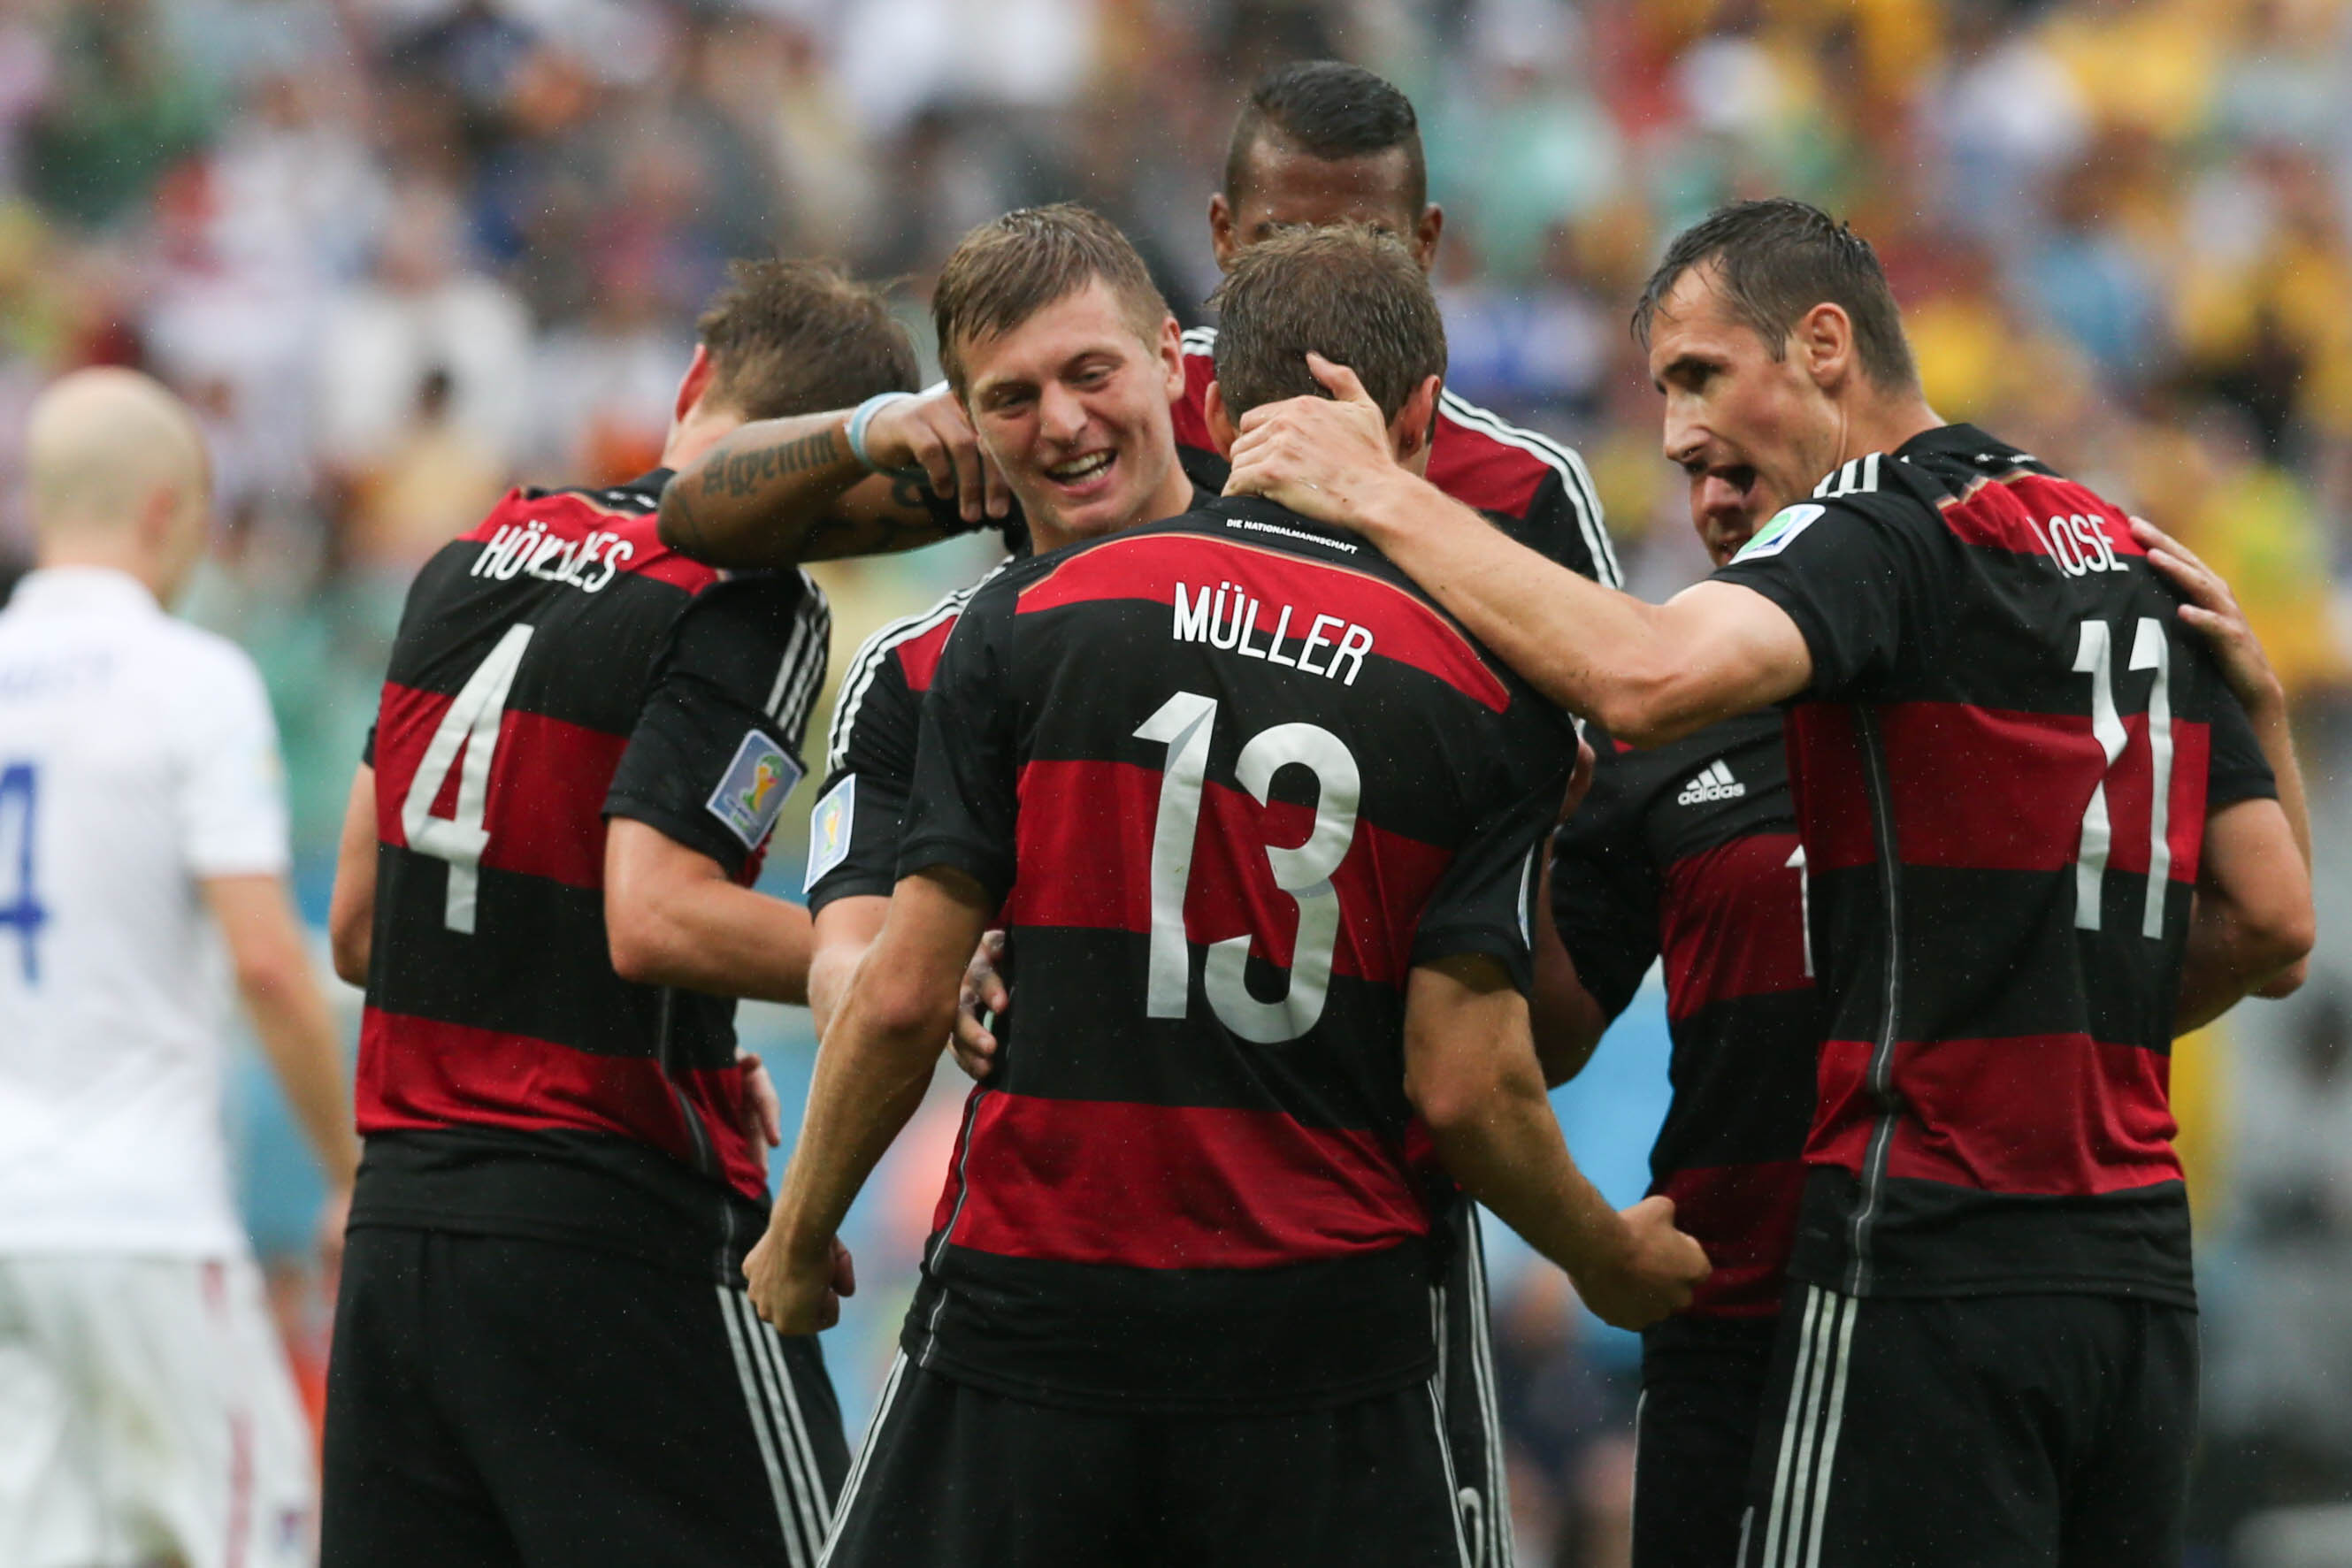 26-06-2014 - PE - Copa do Mundo 2014 - A